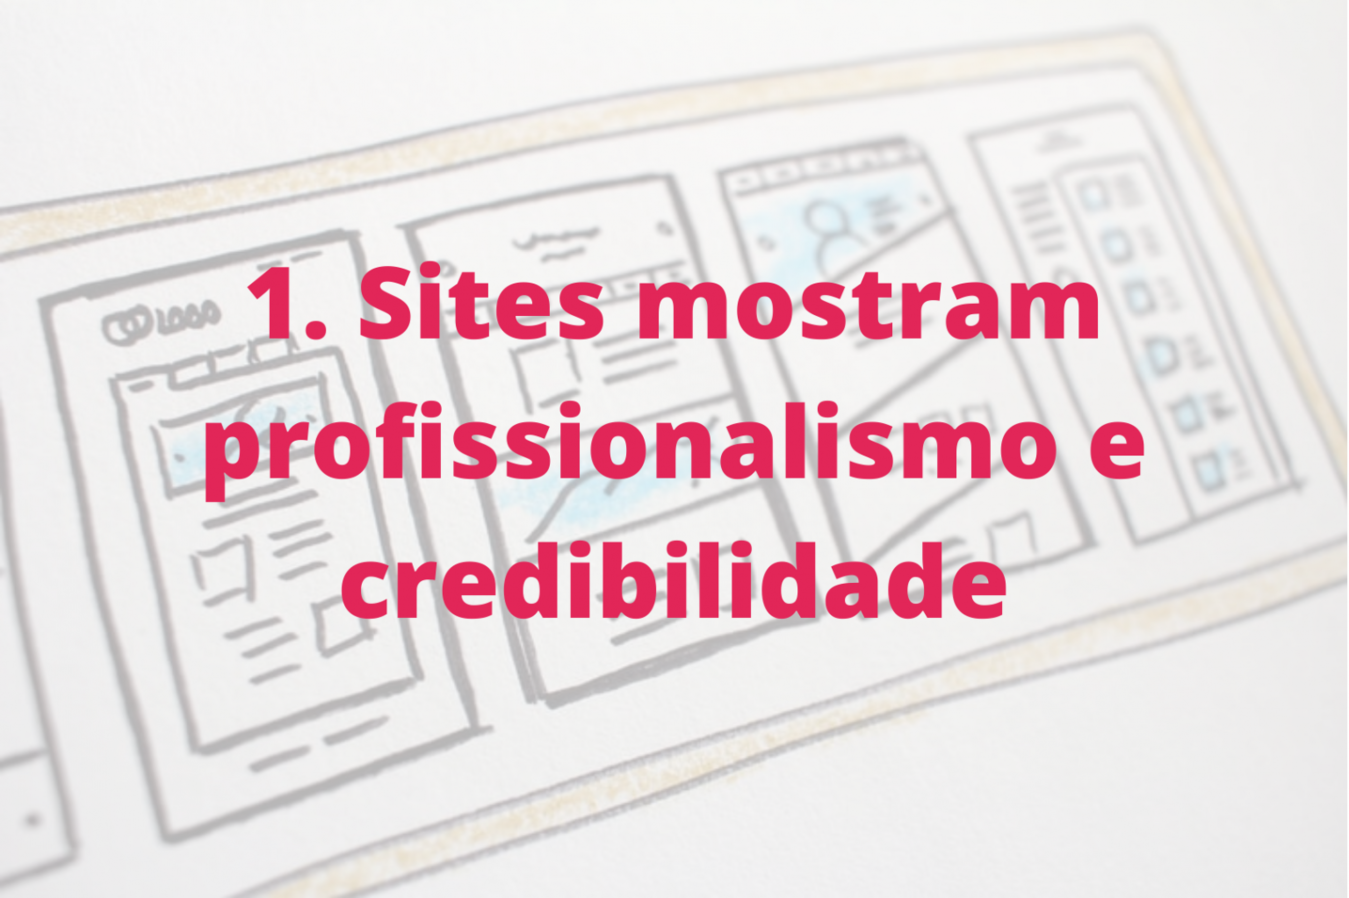 Sites mostram profissionalismo e credibilidade